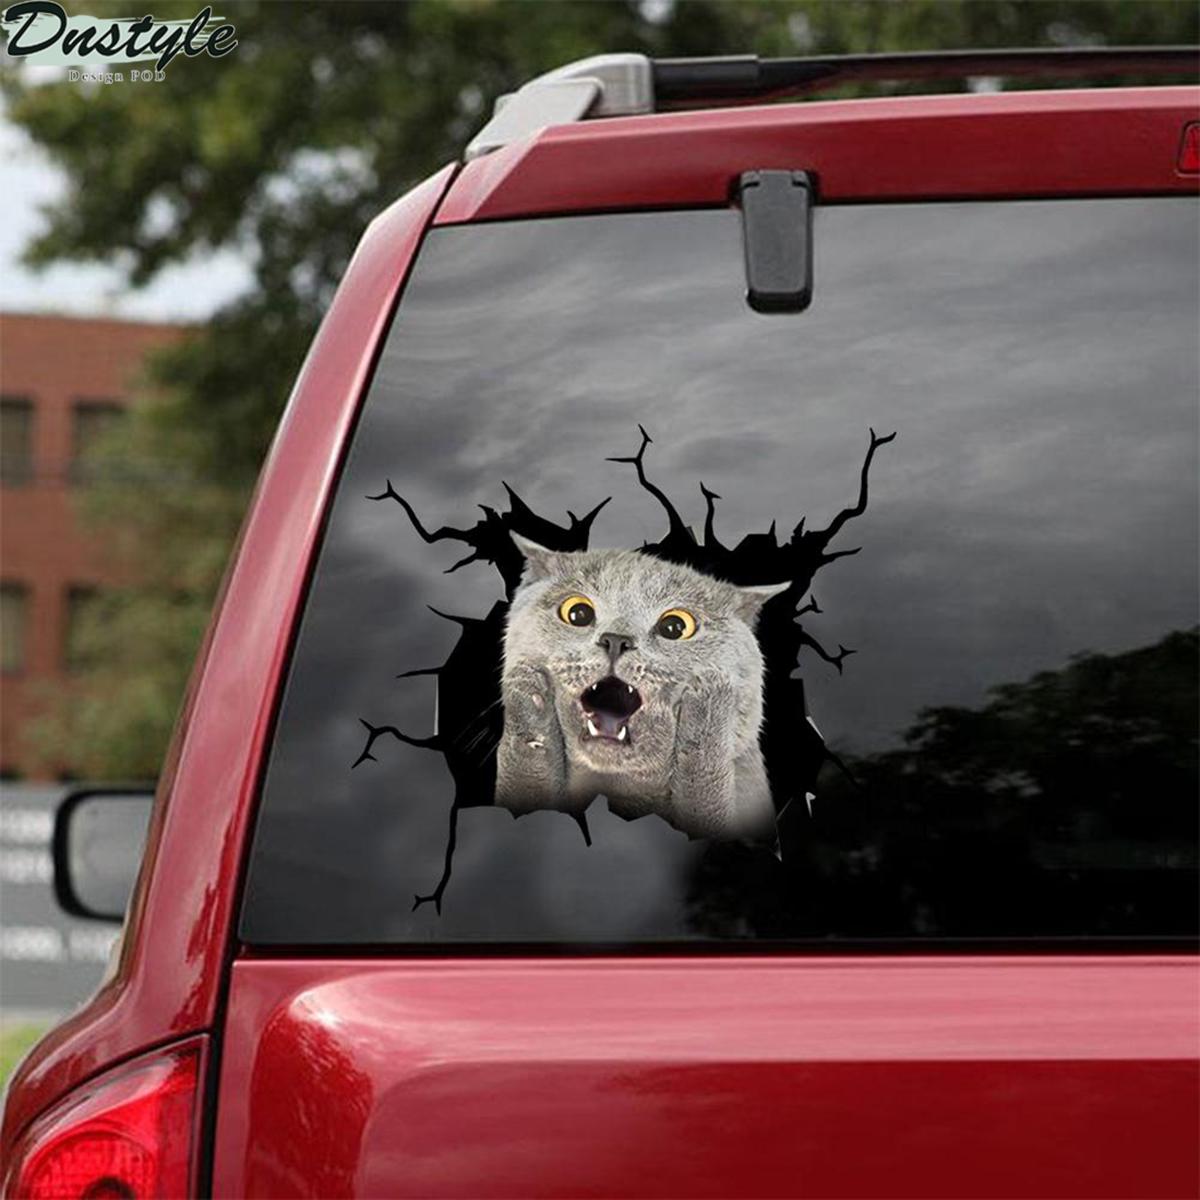 British shorthair screaming crack car decal sticker 2